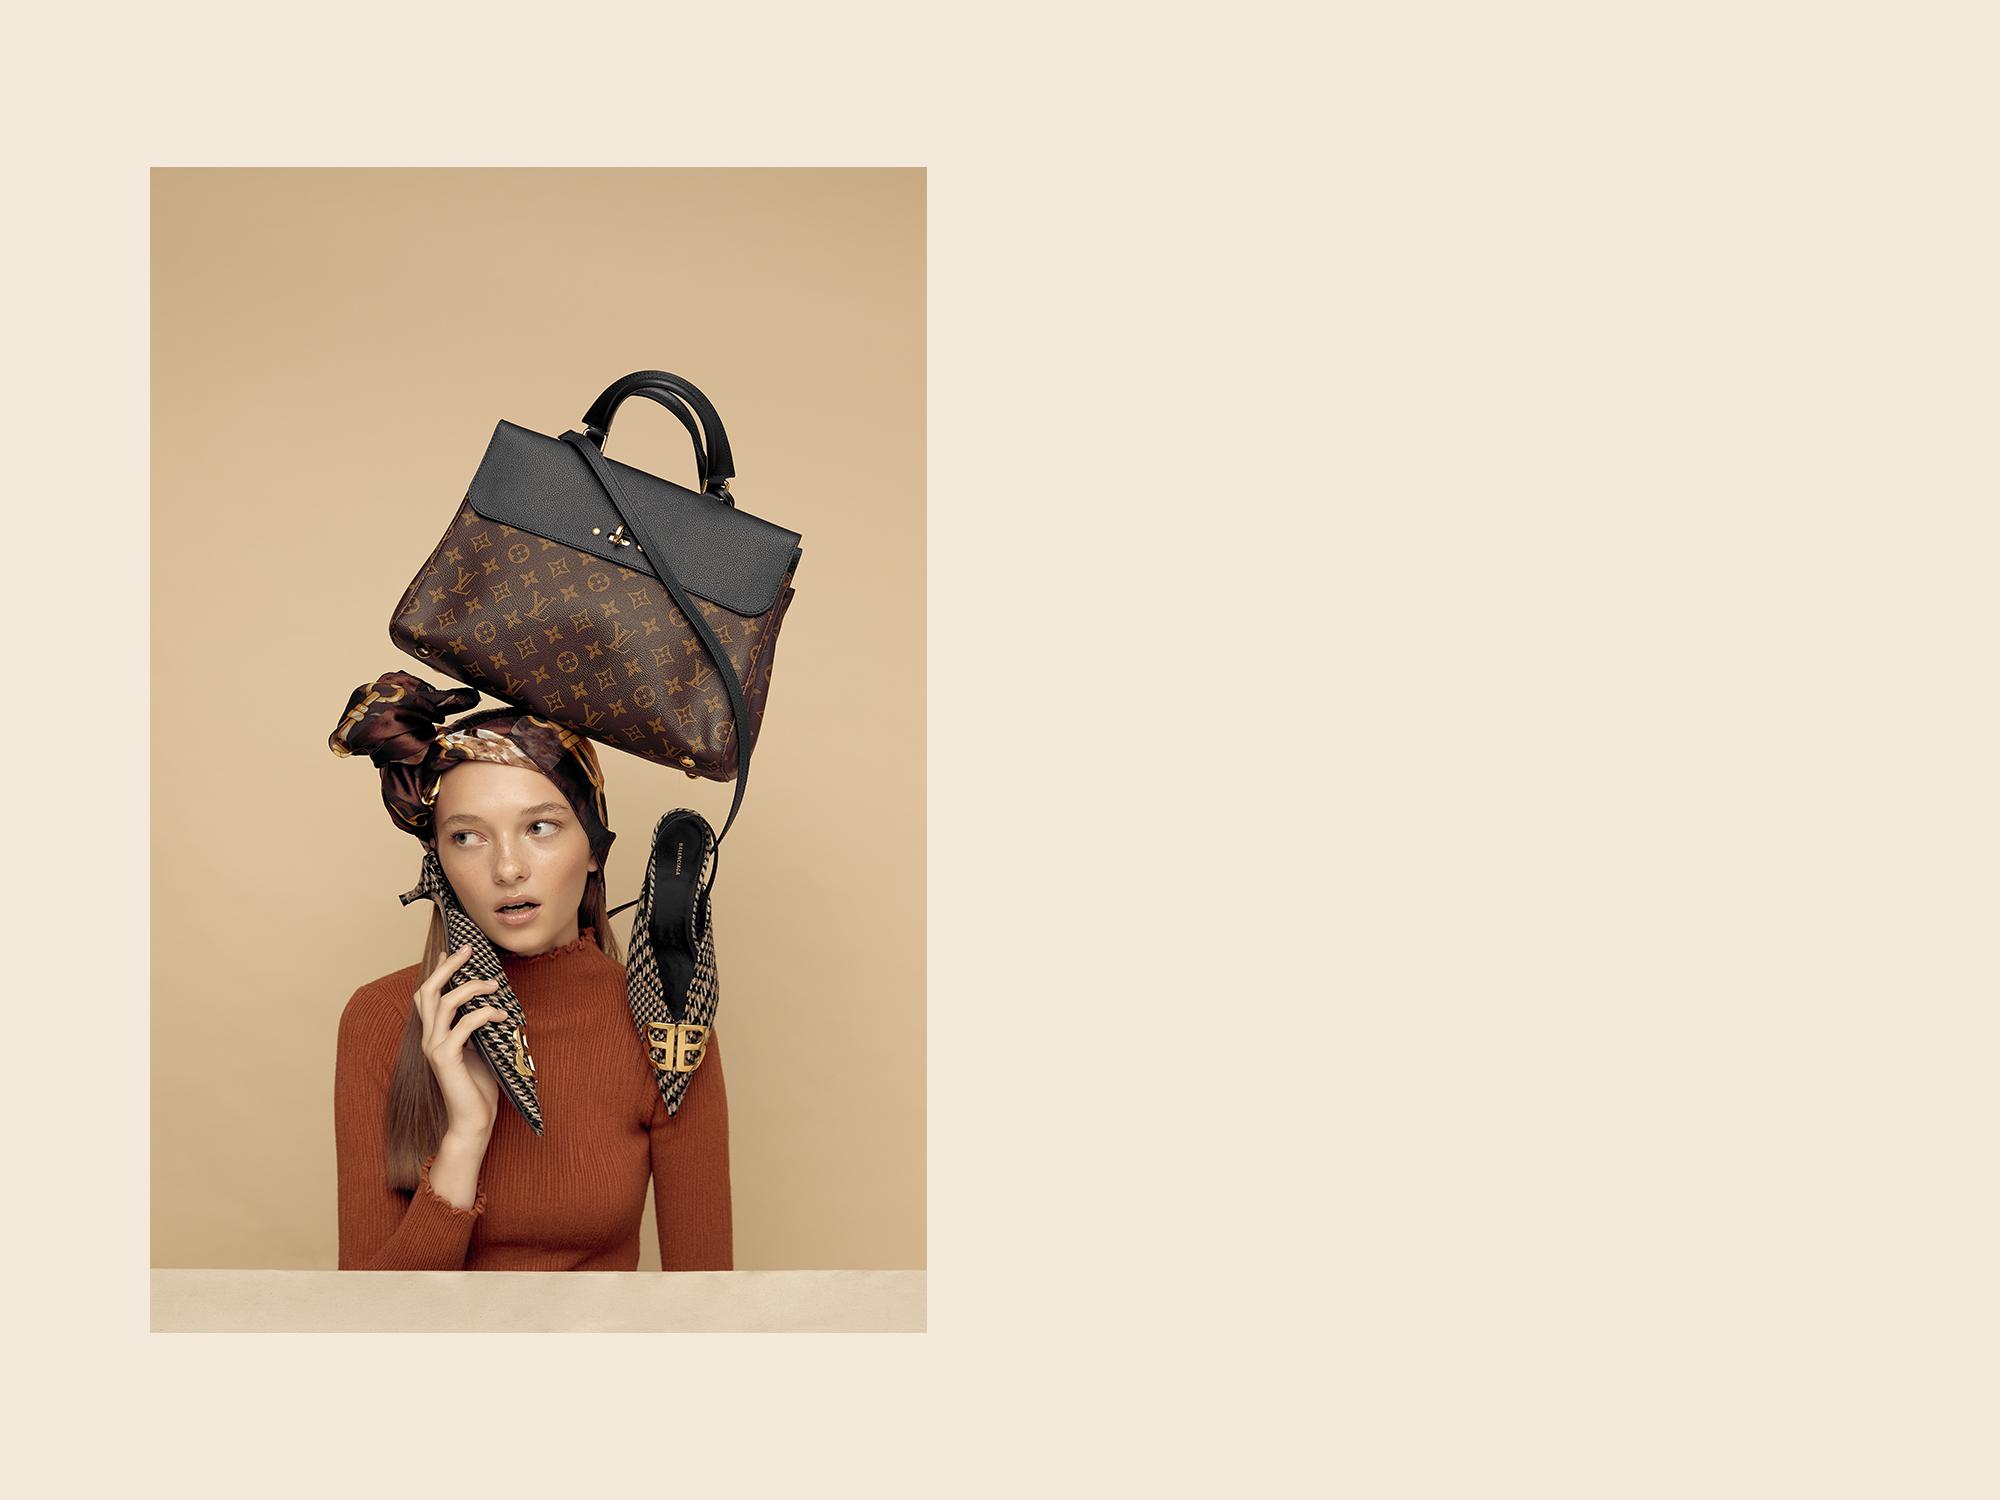 Chanel Boy Bag, Vestaire, Collective. Chanel, 2.55 Bag